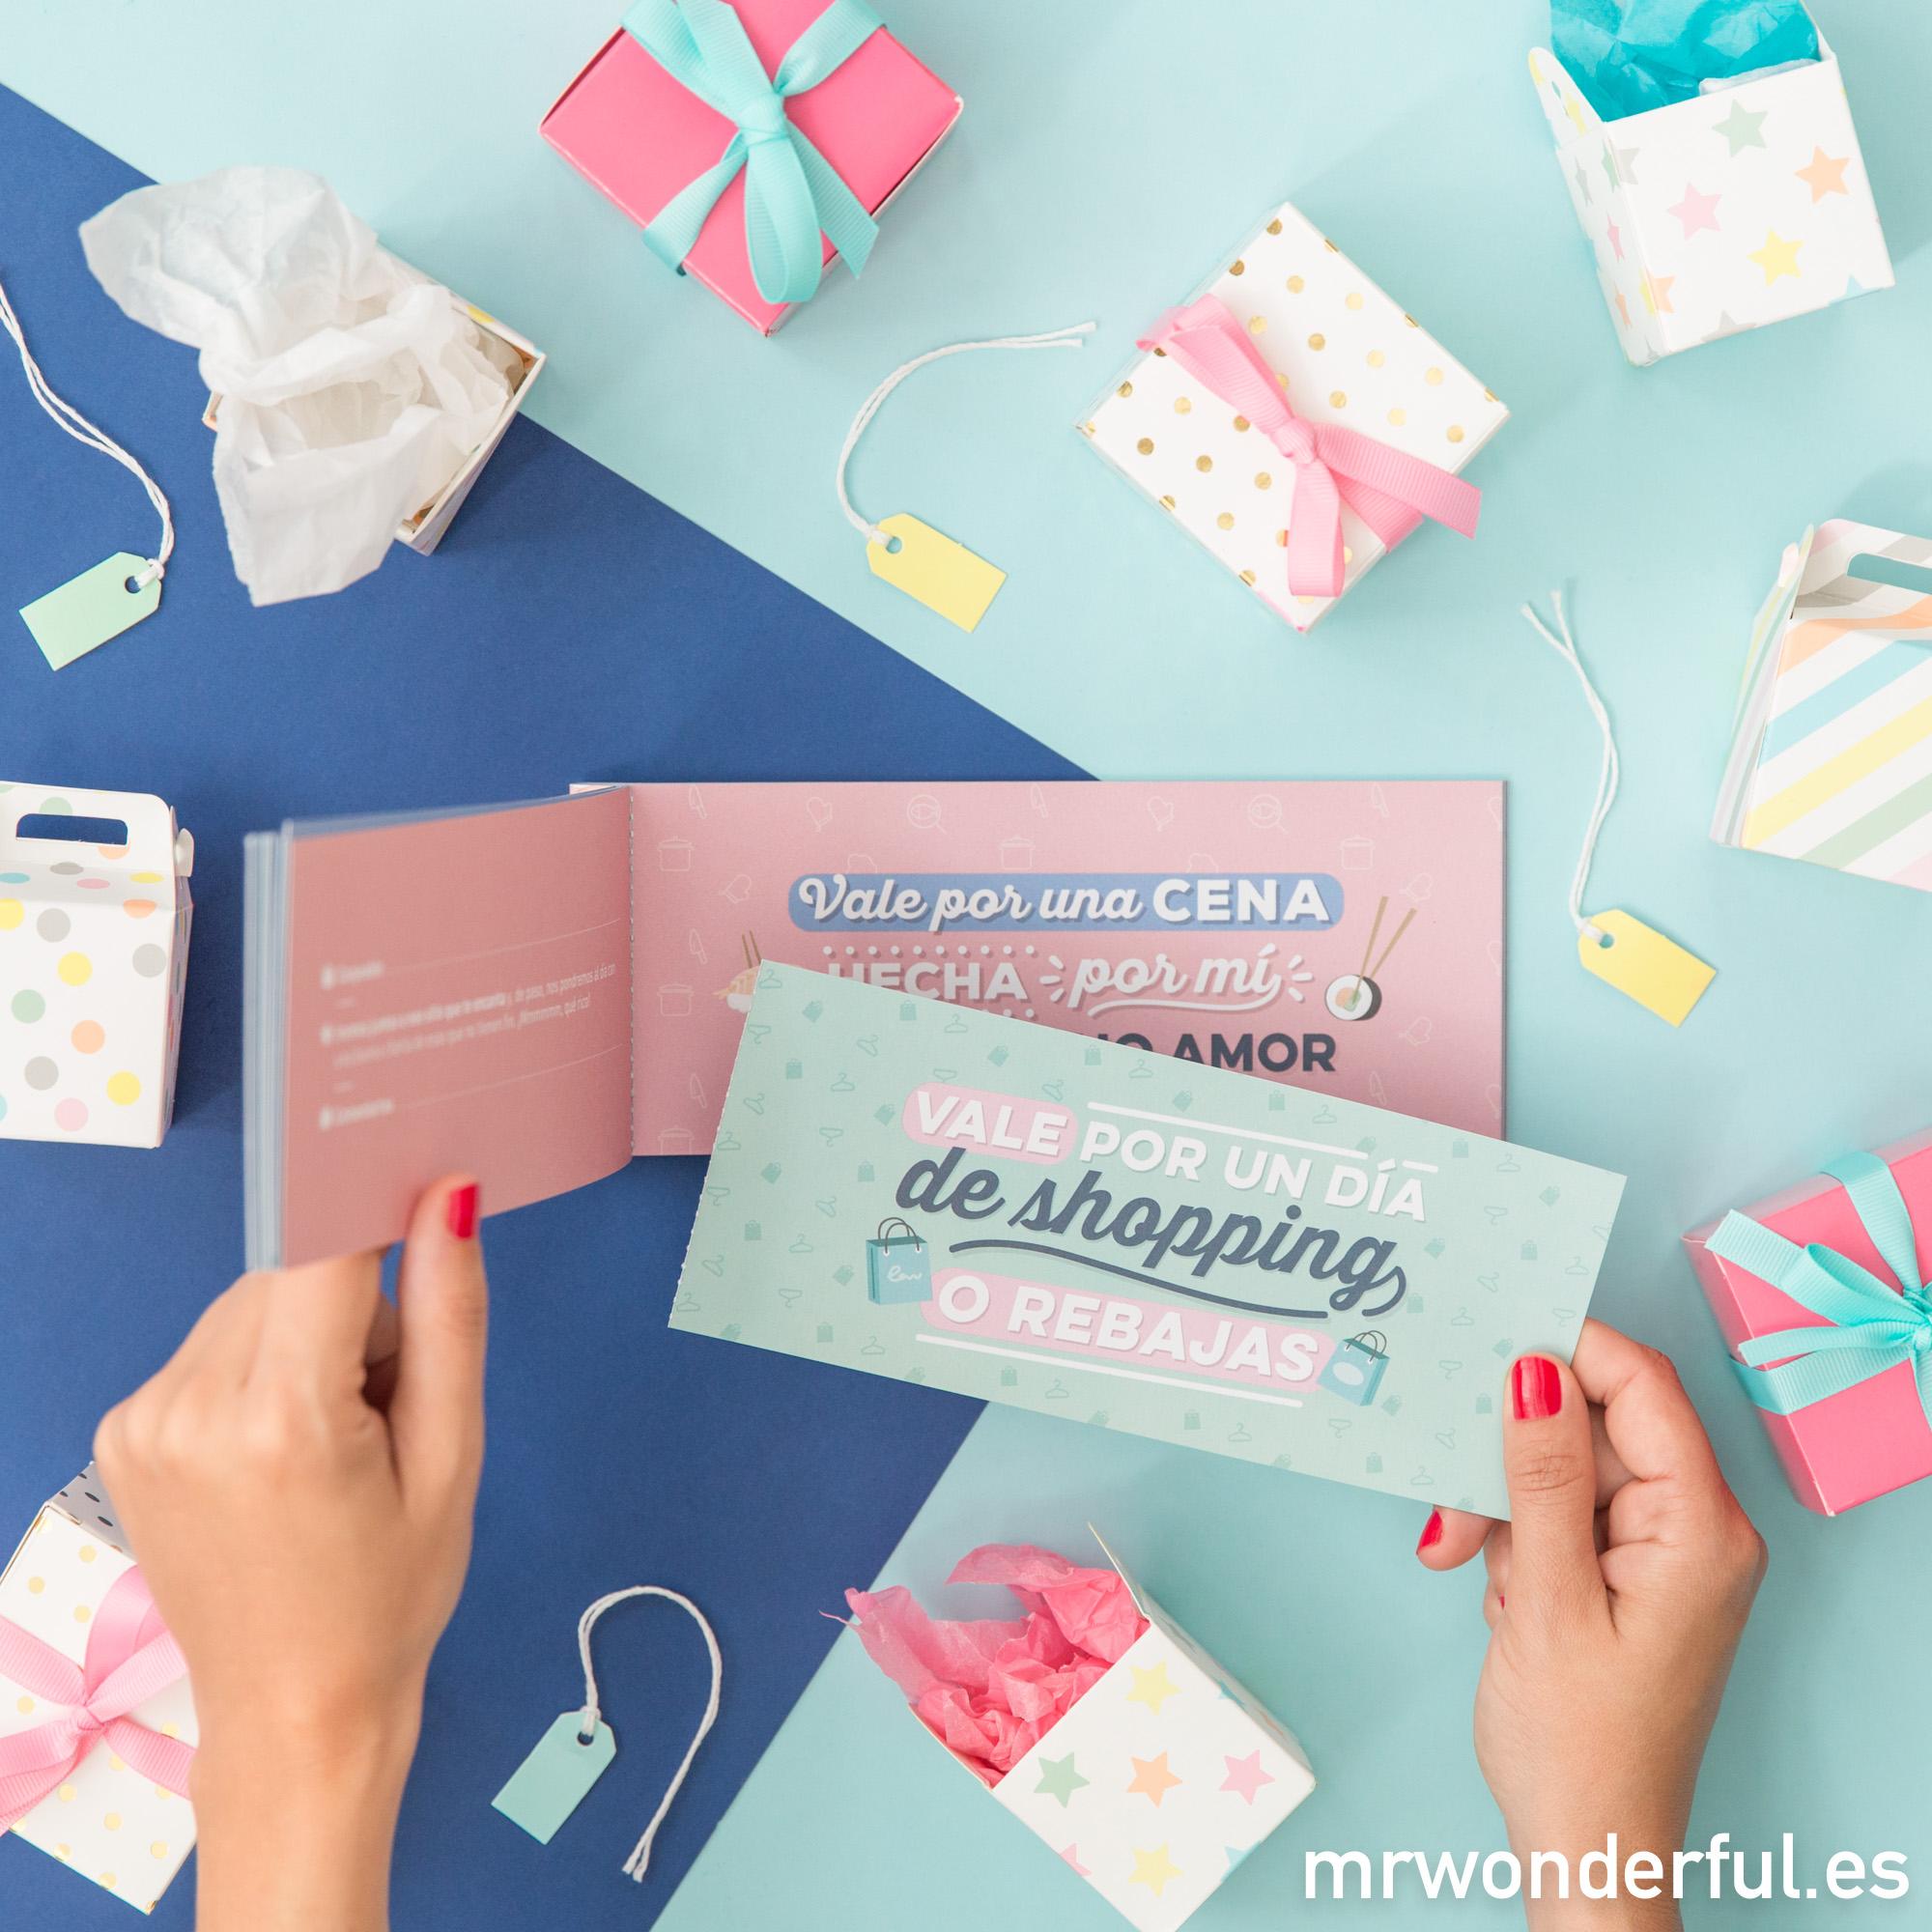 mrwonderful_campana-madre_2017_comunicacion-6-editar